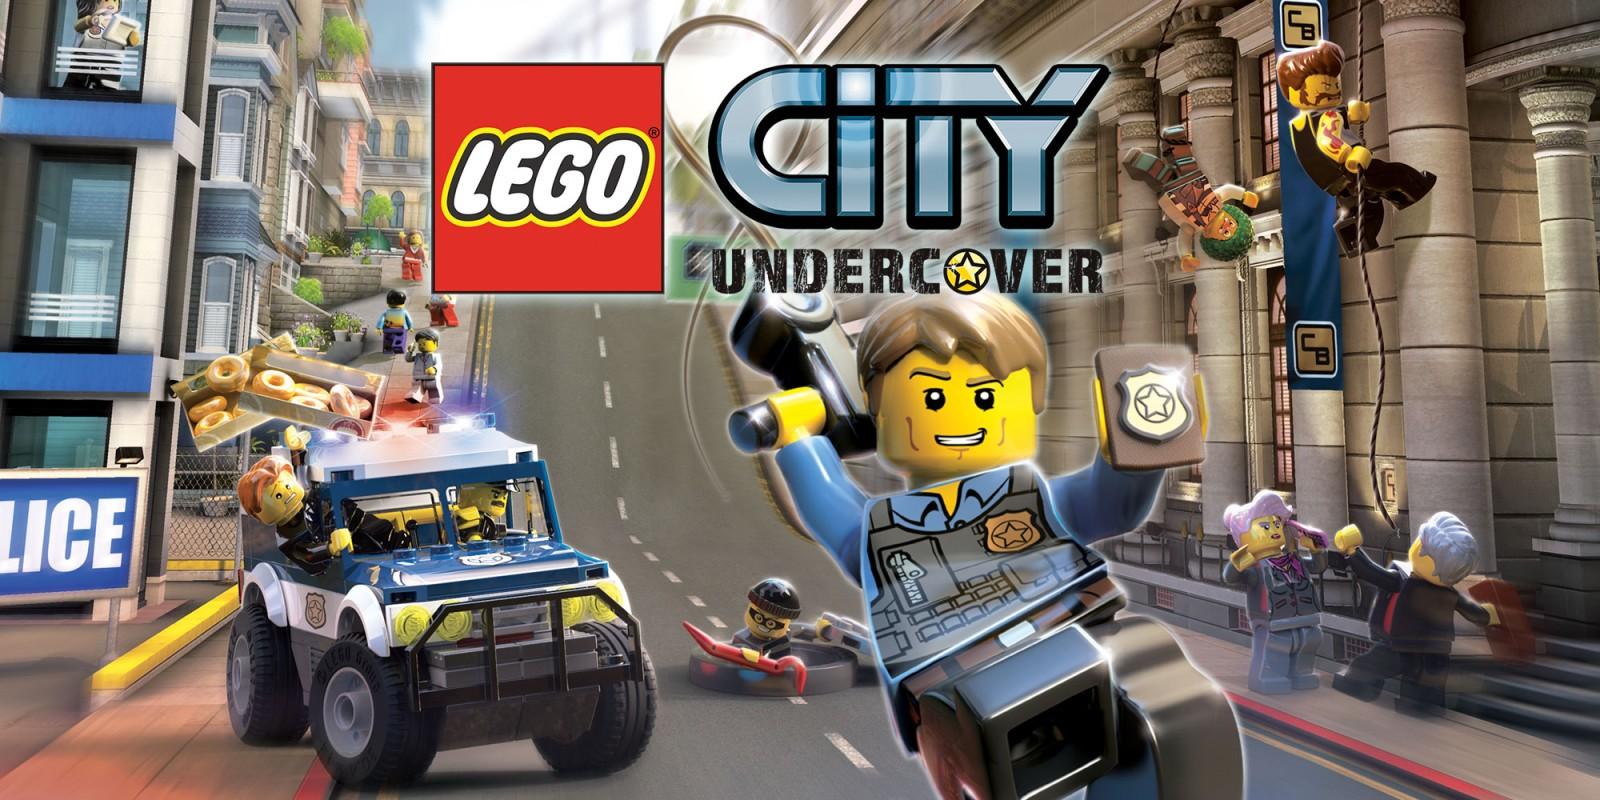 Lego city undercover wii u jeux nintendo - Modele lego gratuit ...